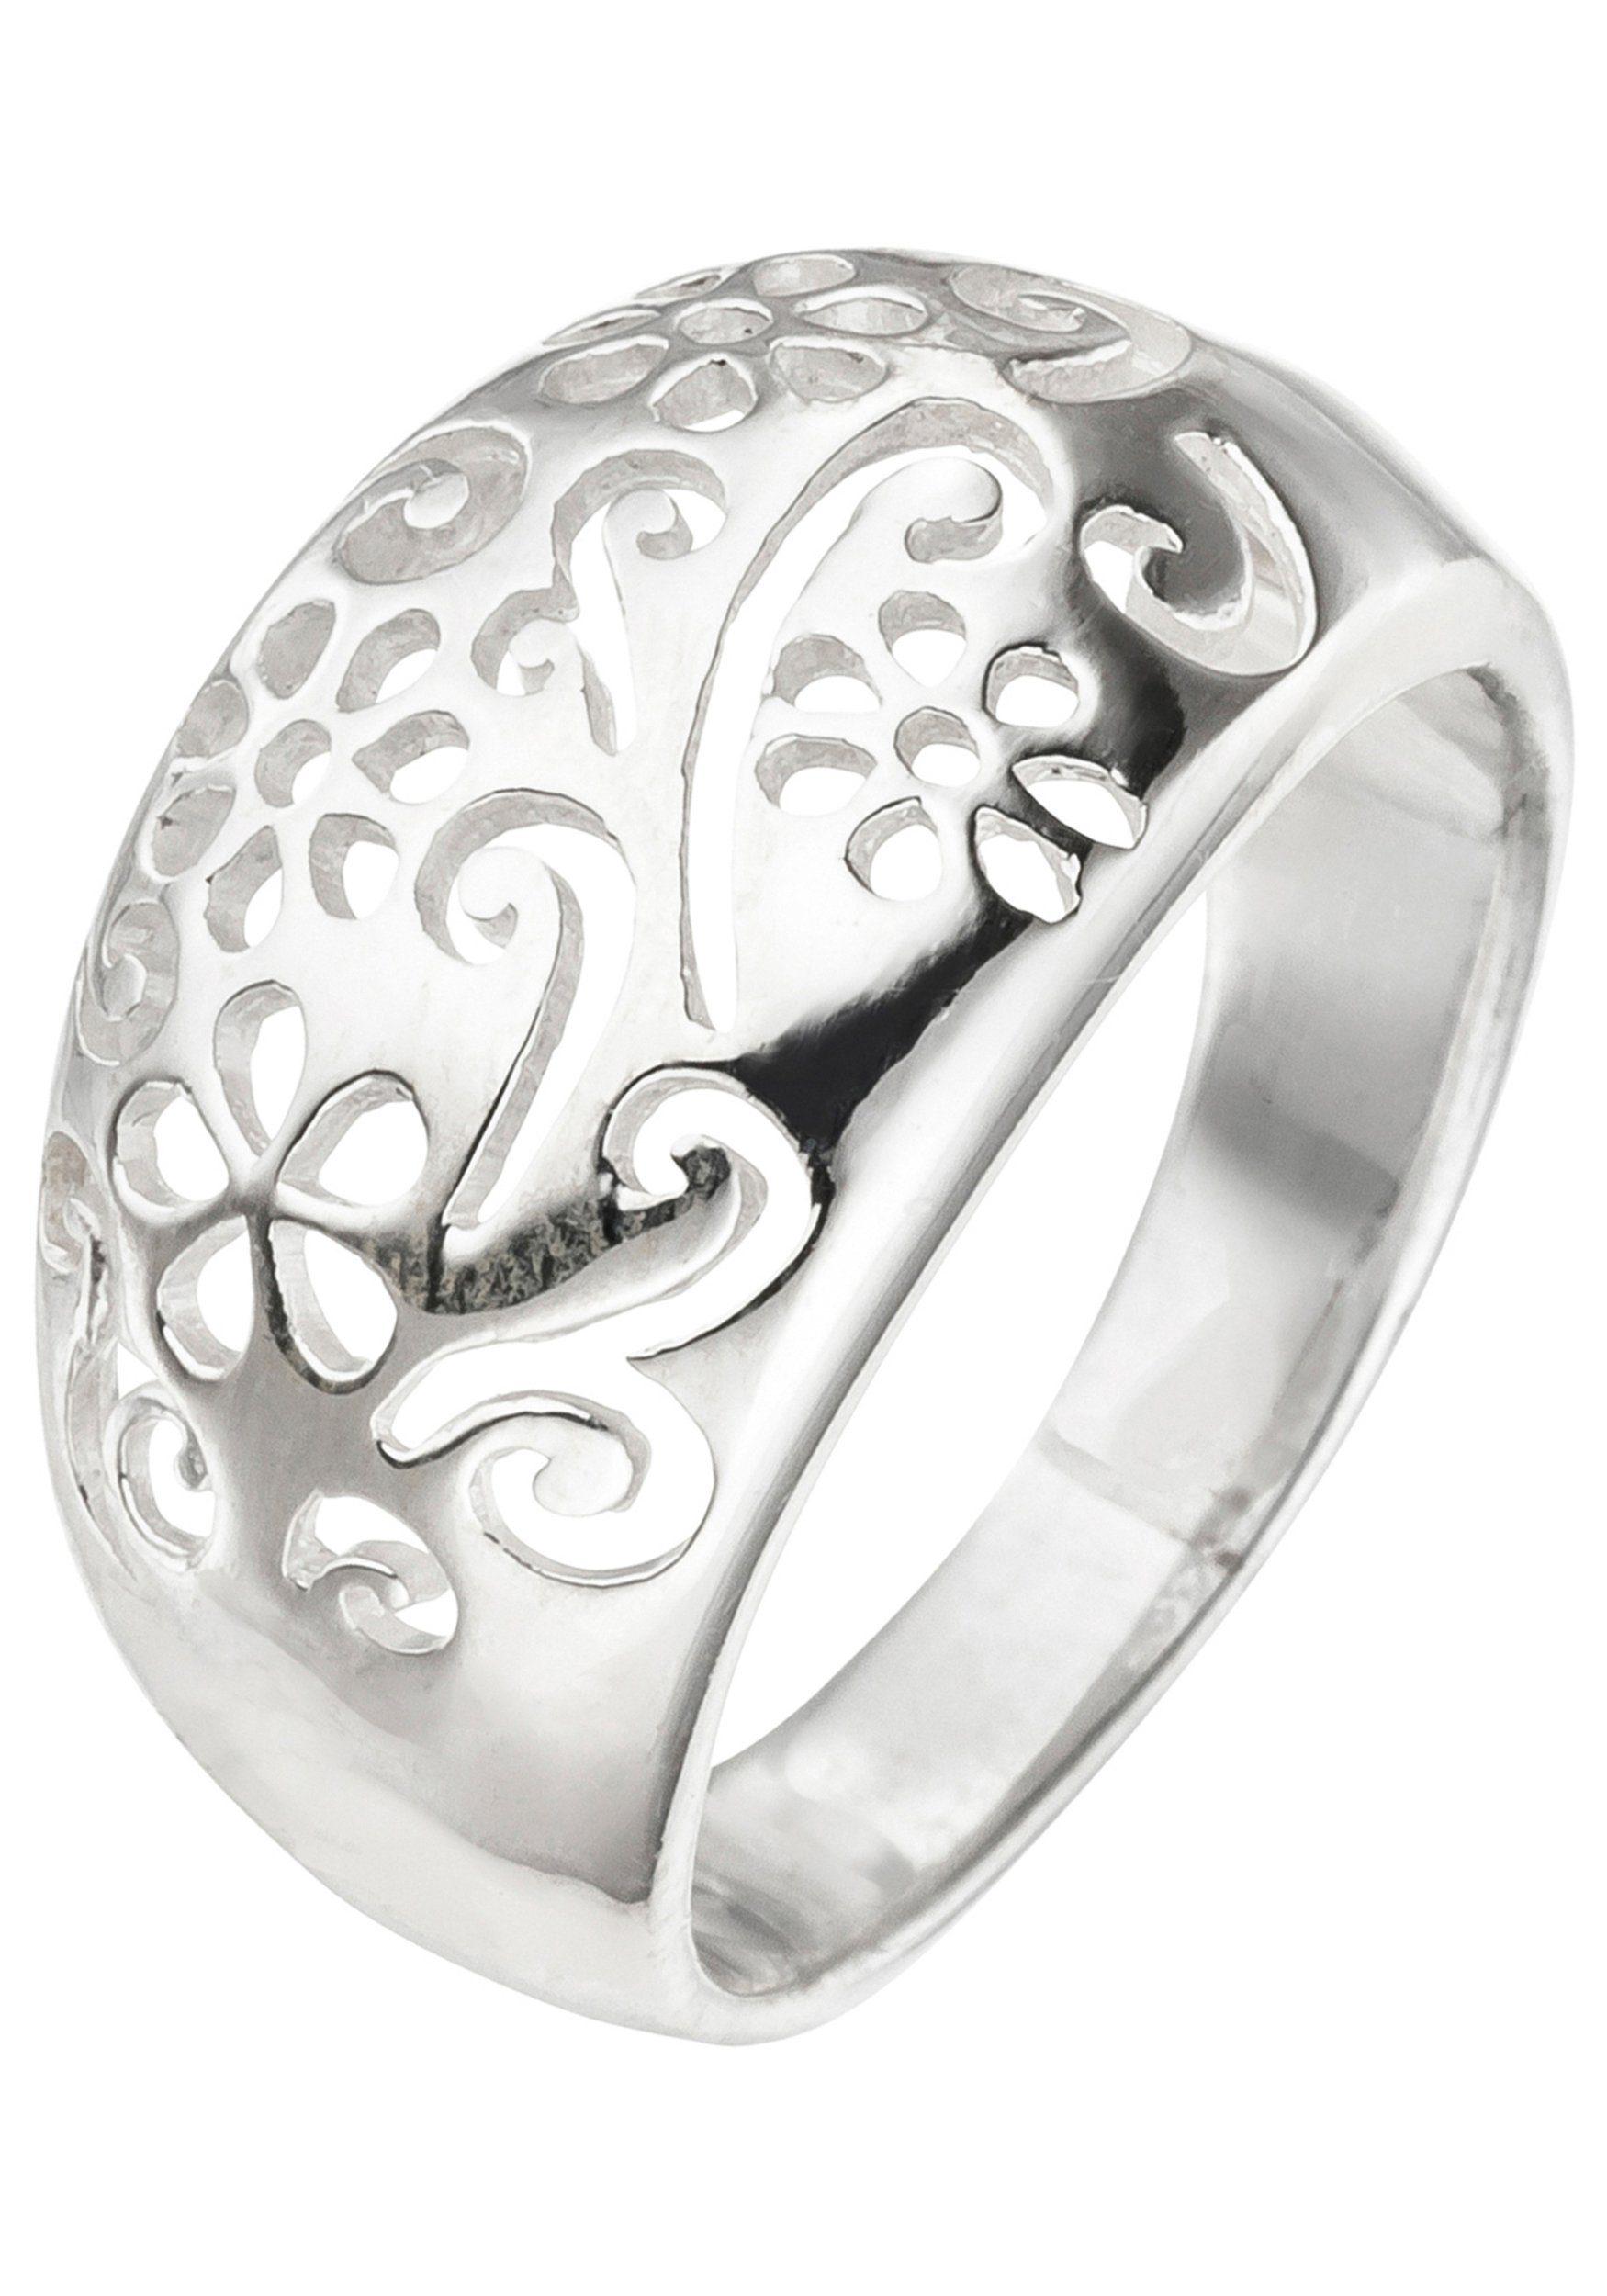 10,4 mm Damen Ring 925 Sterling Silber matt 18 Zirkonia Silberring Breite ca